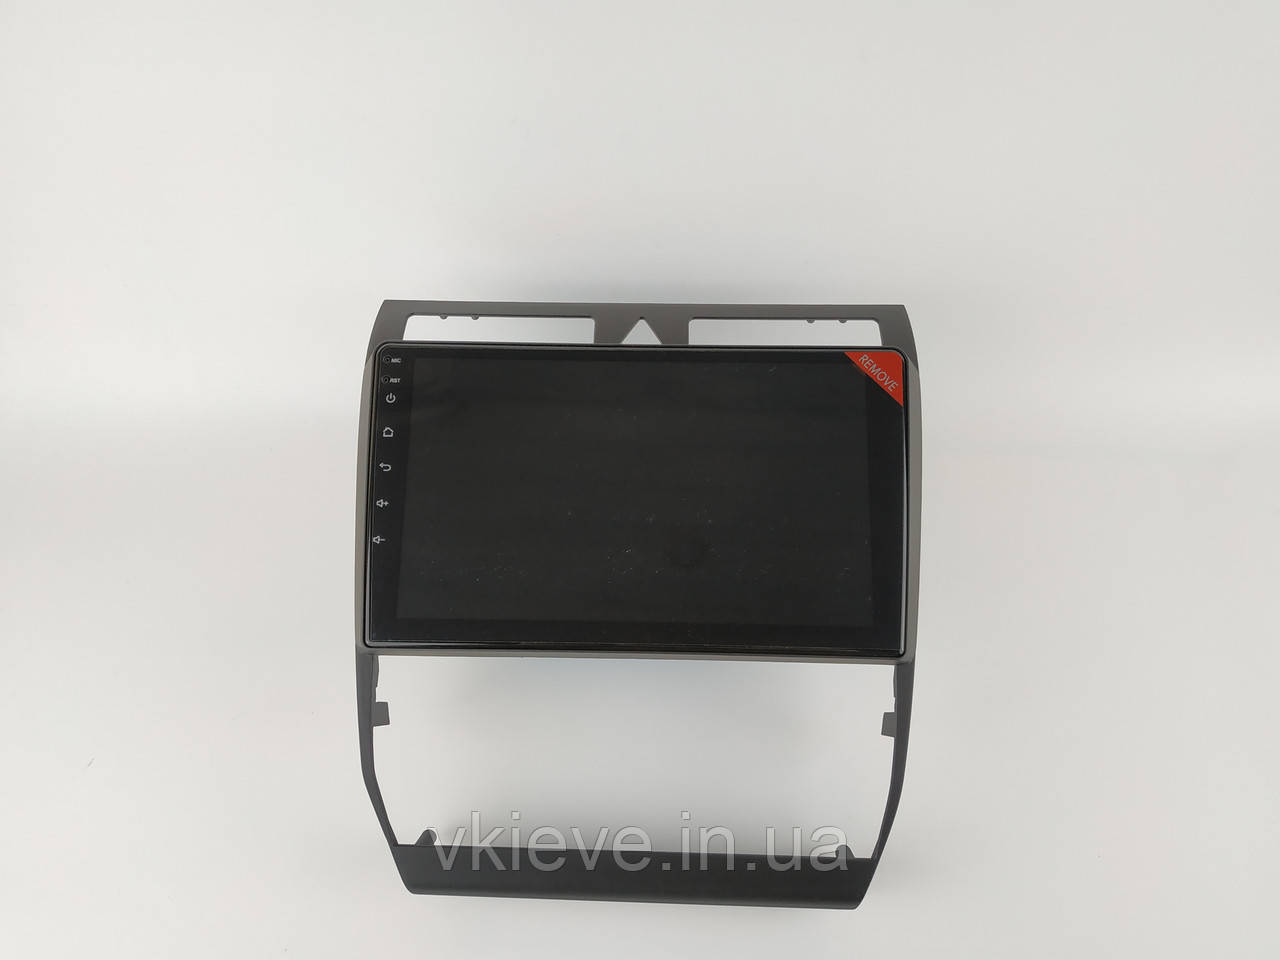 Штатна автомагнітола для Audi A6 2004 на ANDROID 8.1